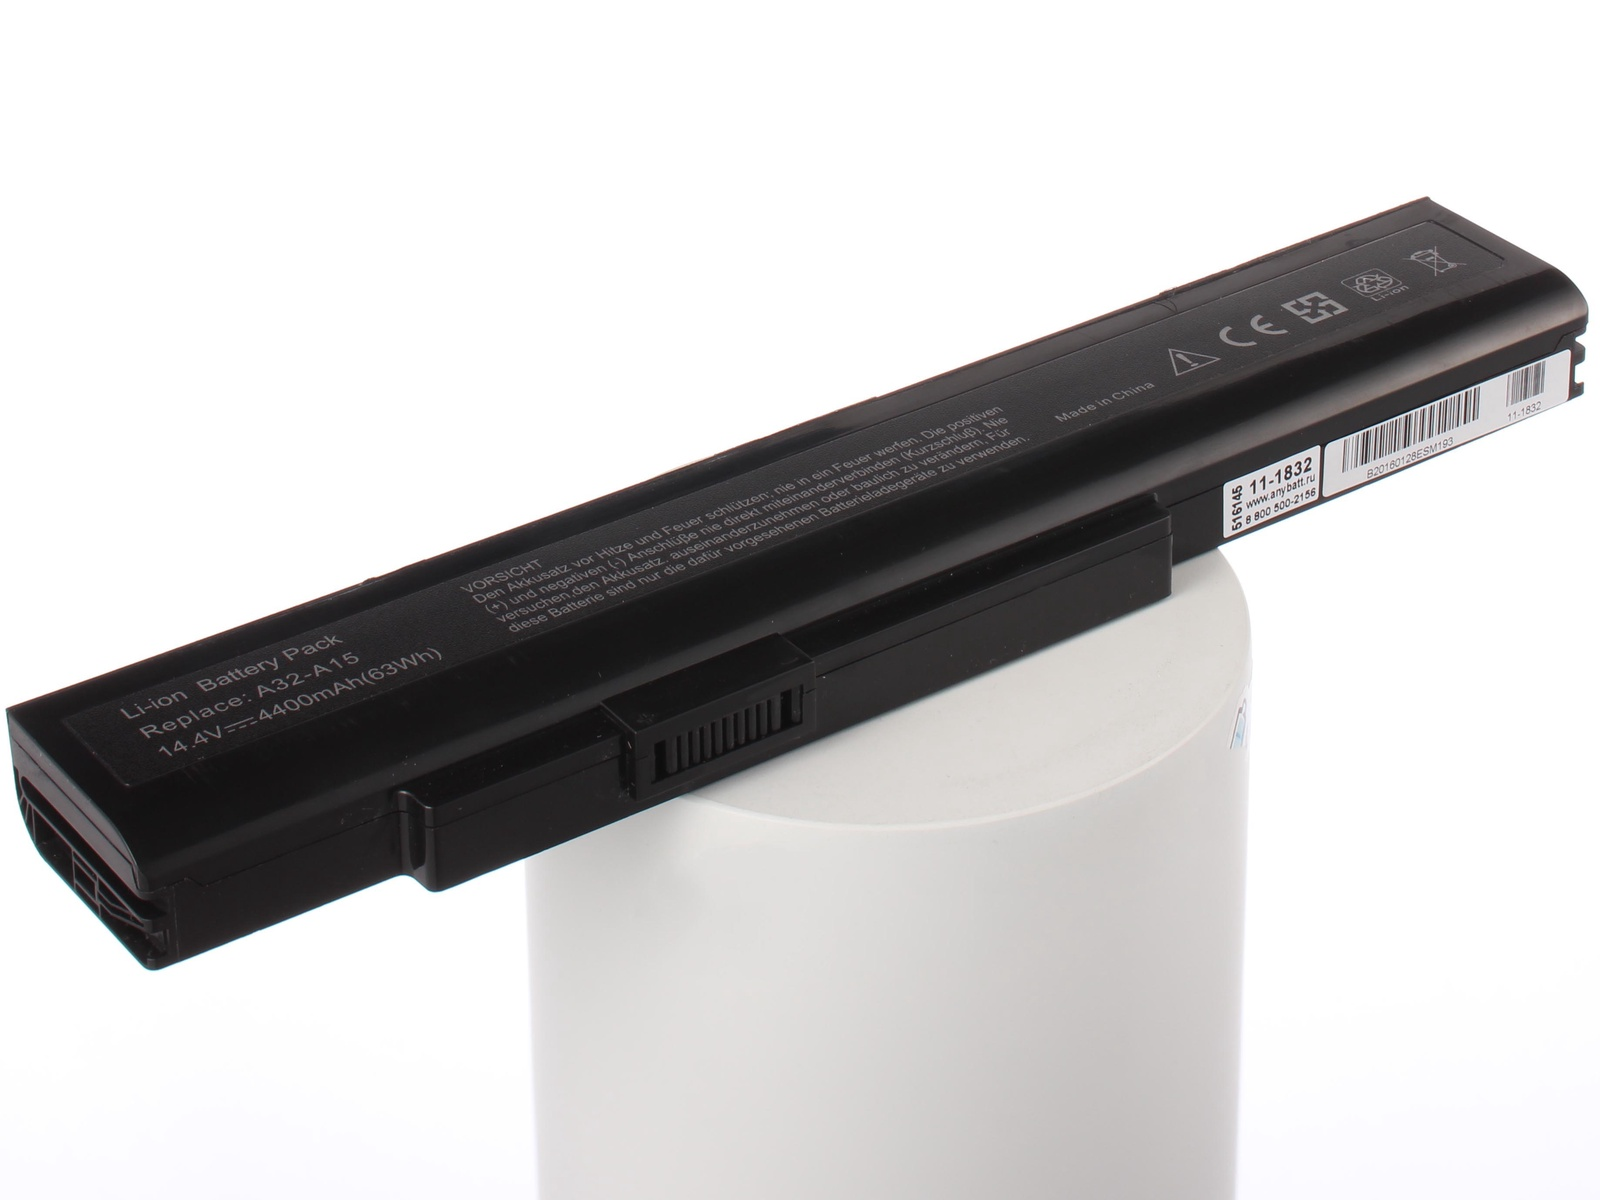 Аккумулятор для ноутбука AnyBatt MSI A32-A15, A42-A15, A41-A15, CS-MD9776NB, A42-H36, iB-A832, 11-1832, FMVNB218, iB-A1420, iB-A1420H, iB-A832H 1000pcs transistor mpsa 42 mpsa42 a42 mps a42 to 92